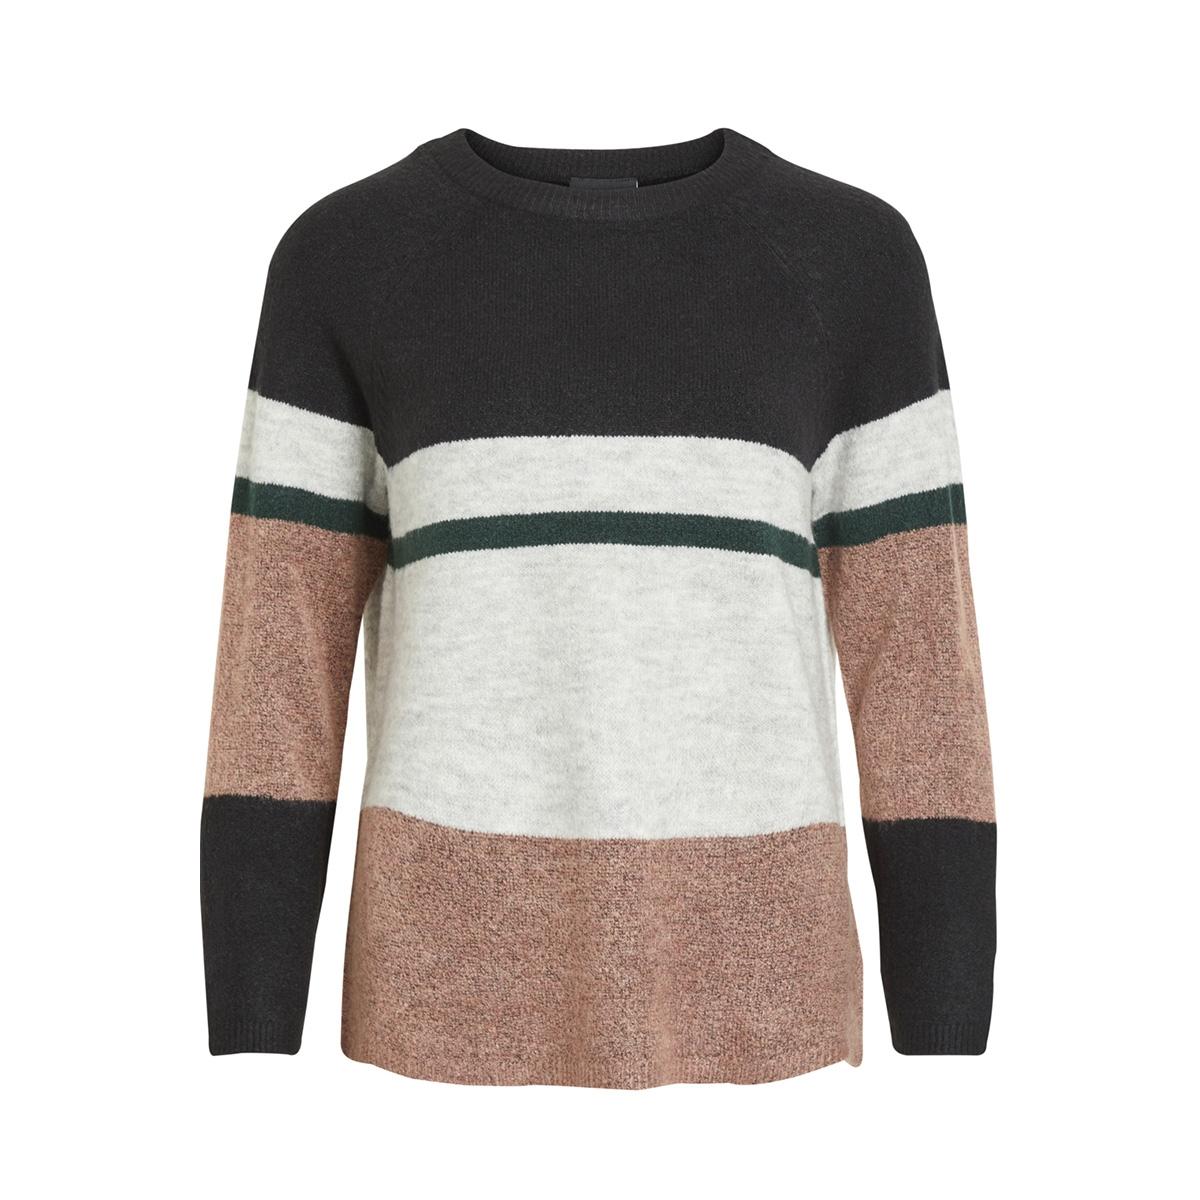 objcody evelyn l/s knit pullover 98 23027334 object trui light mahogany/color block